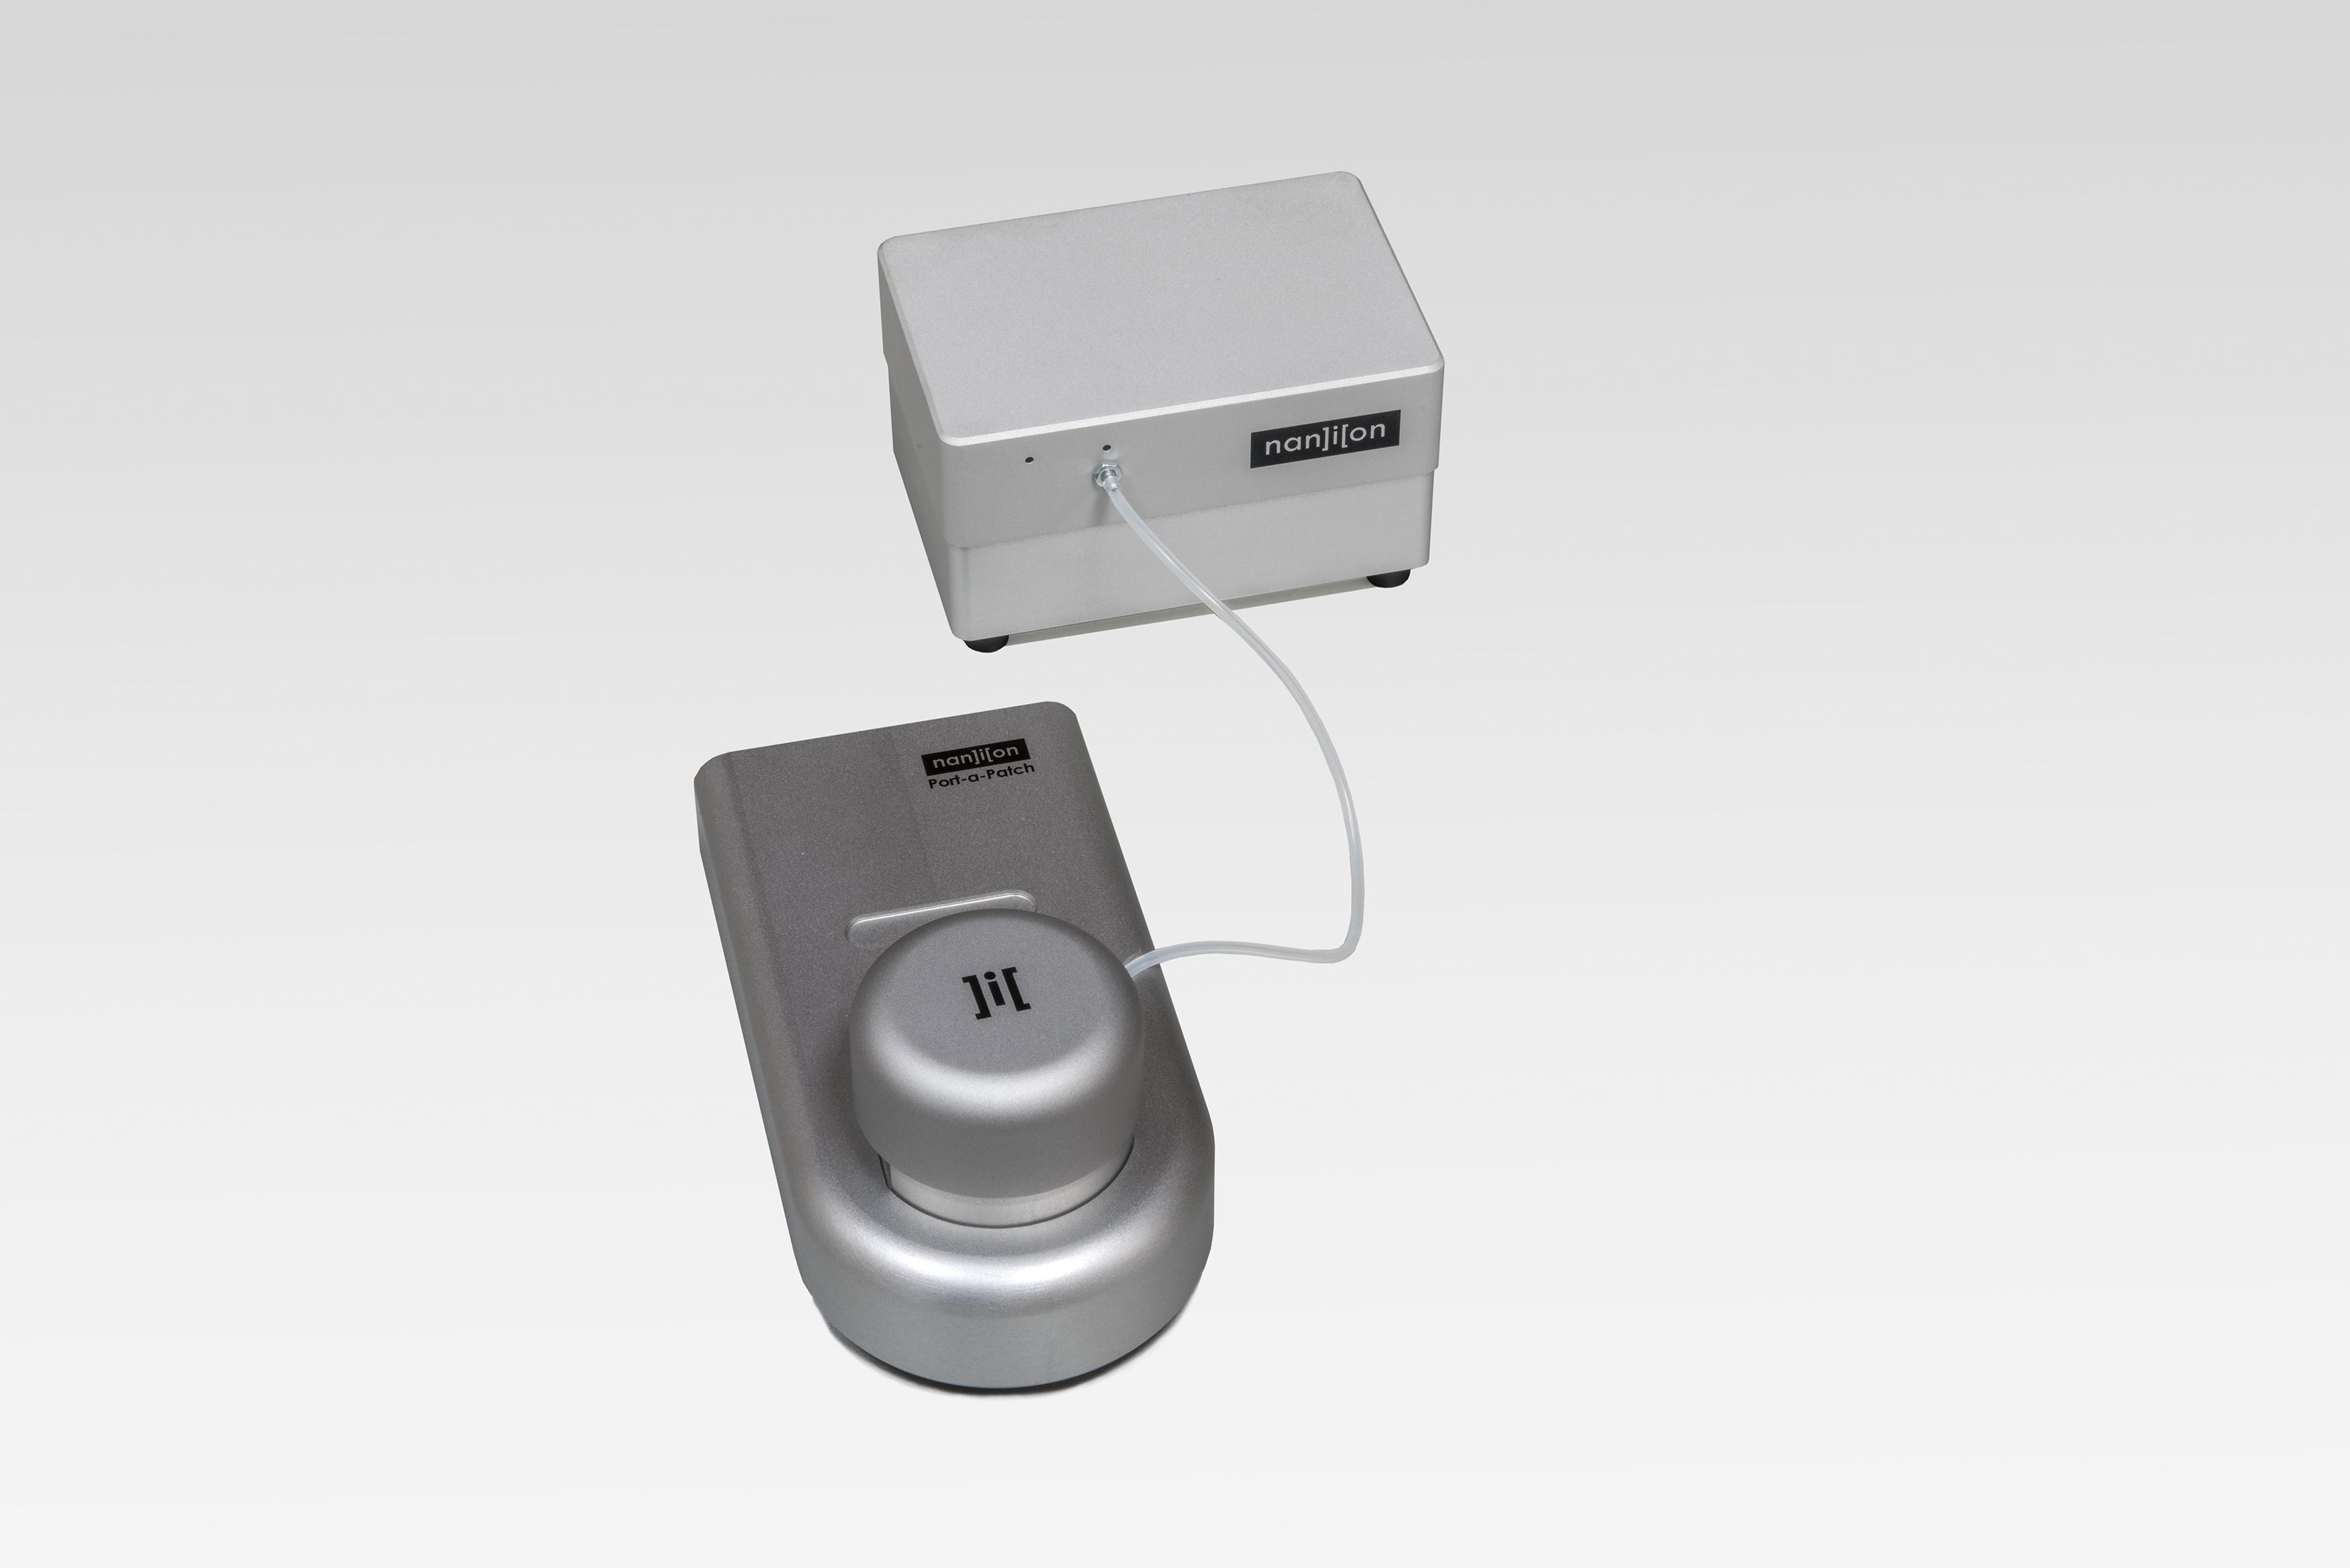 Port-a-Patch mini全自动膜片钳